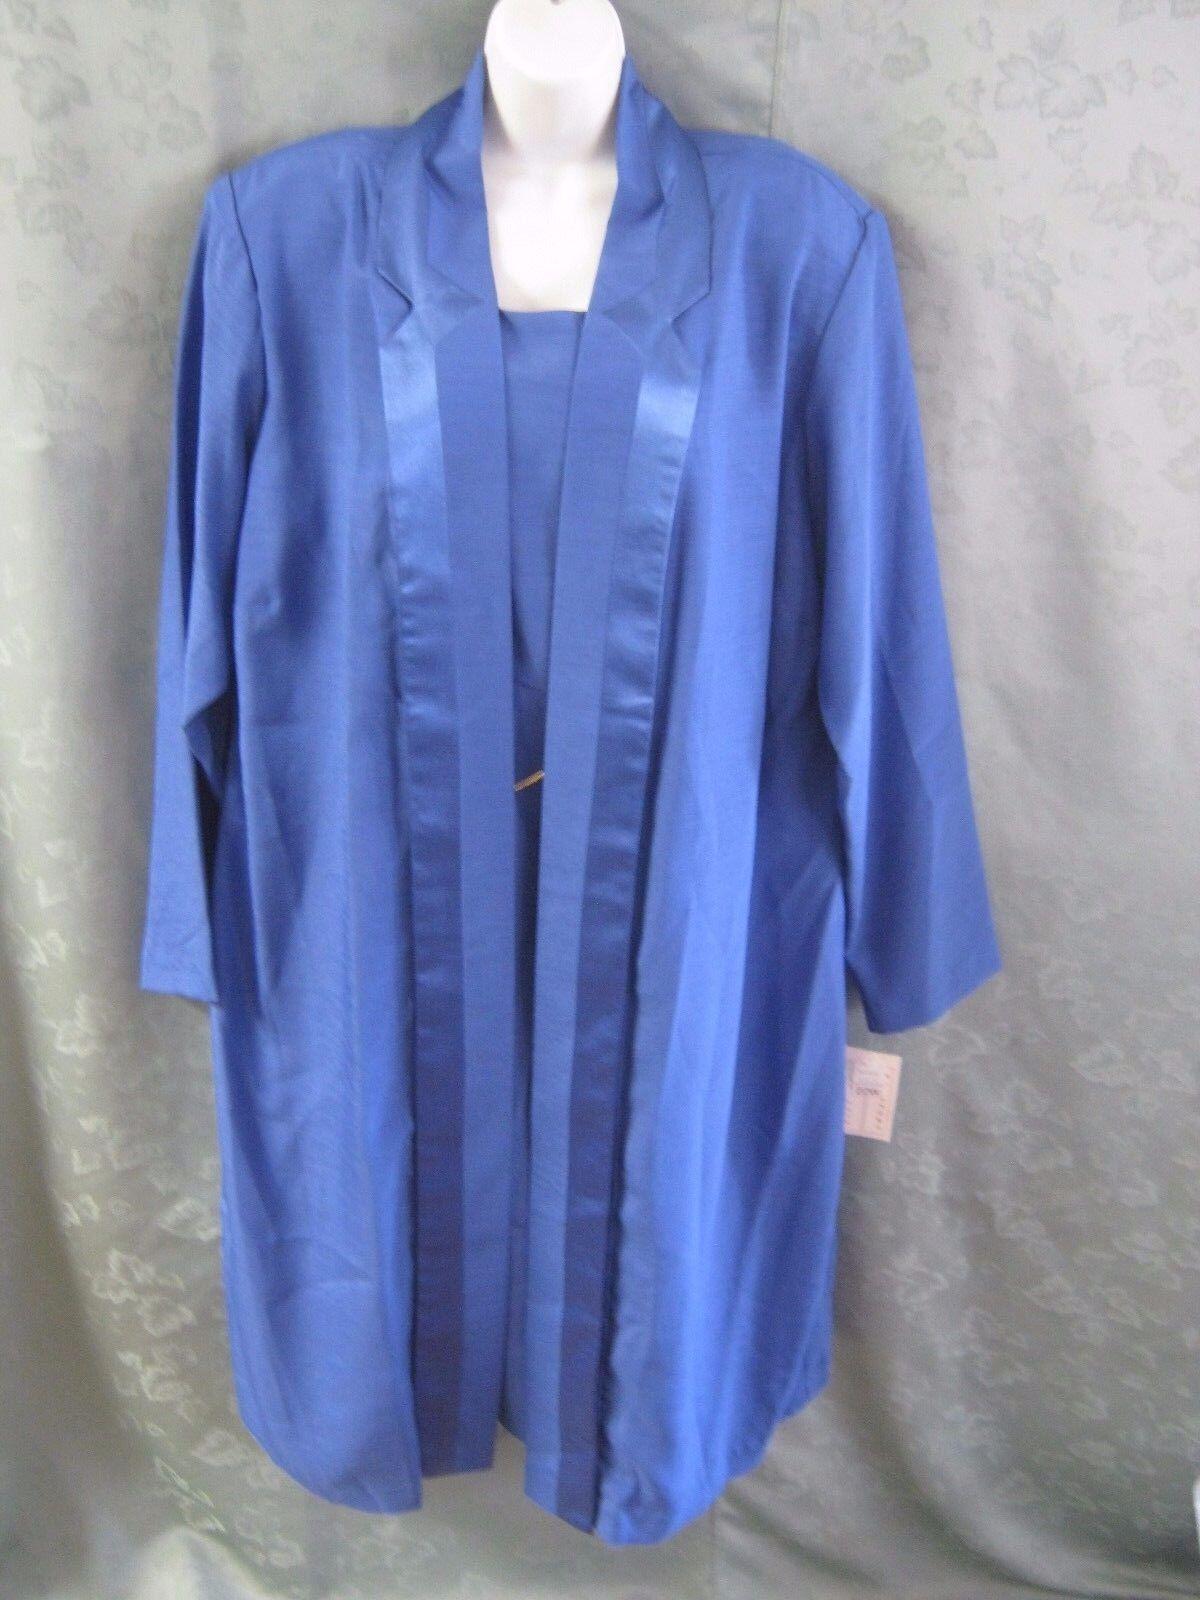 P I New York Sleeveless Dress & Long Open Front Blazer Set Plus Größe 22W NWT